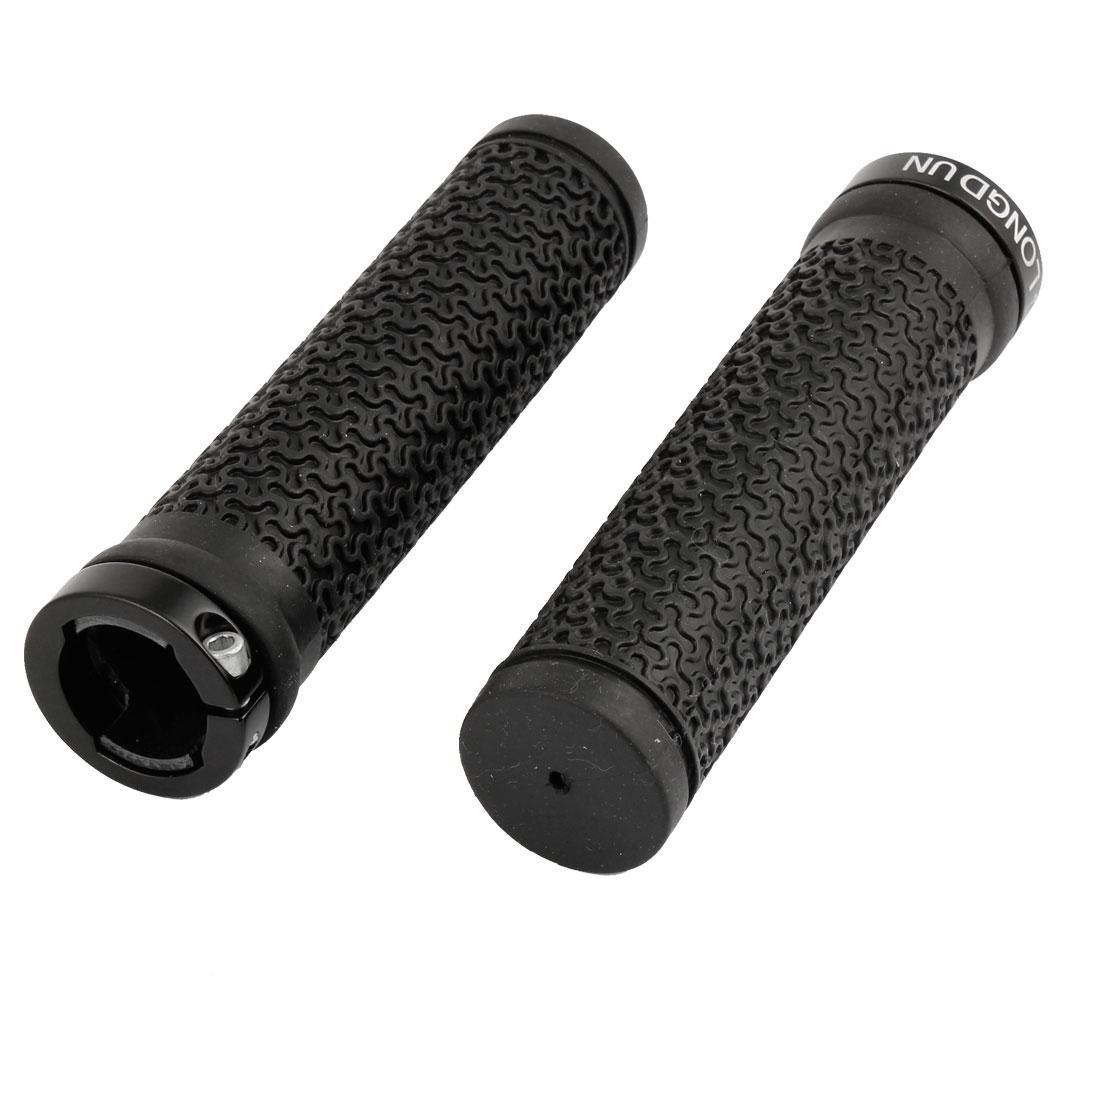 2 Pcs Black Non-slip Rubber Handlebar Grip Cover for Bike Bicycle